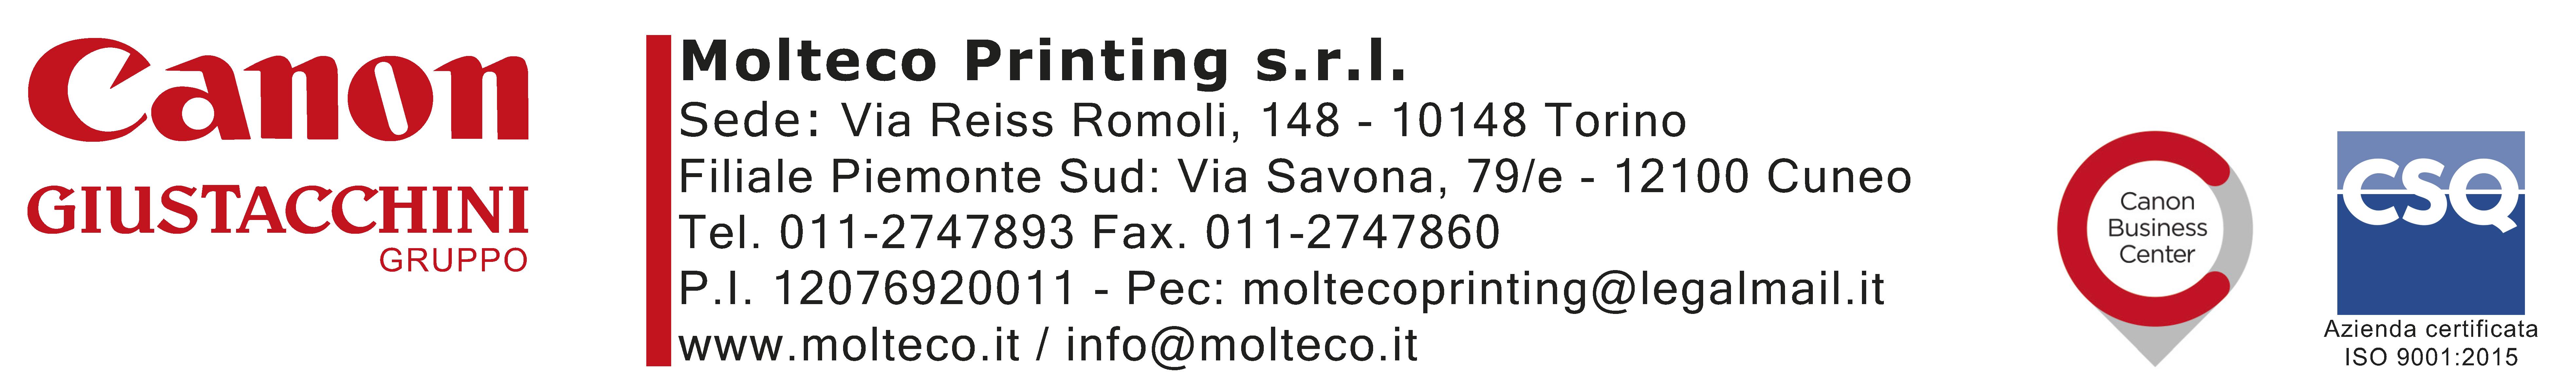 Molteco printing